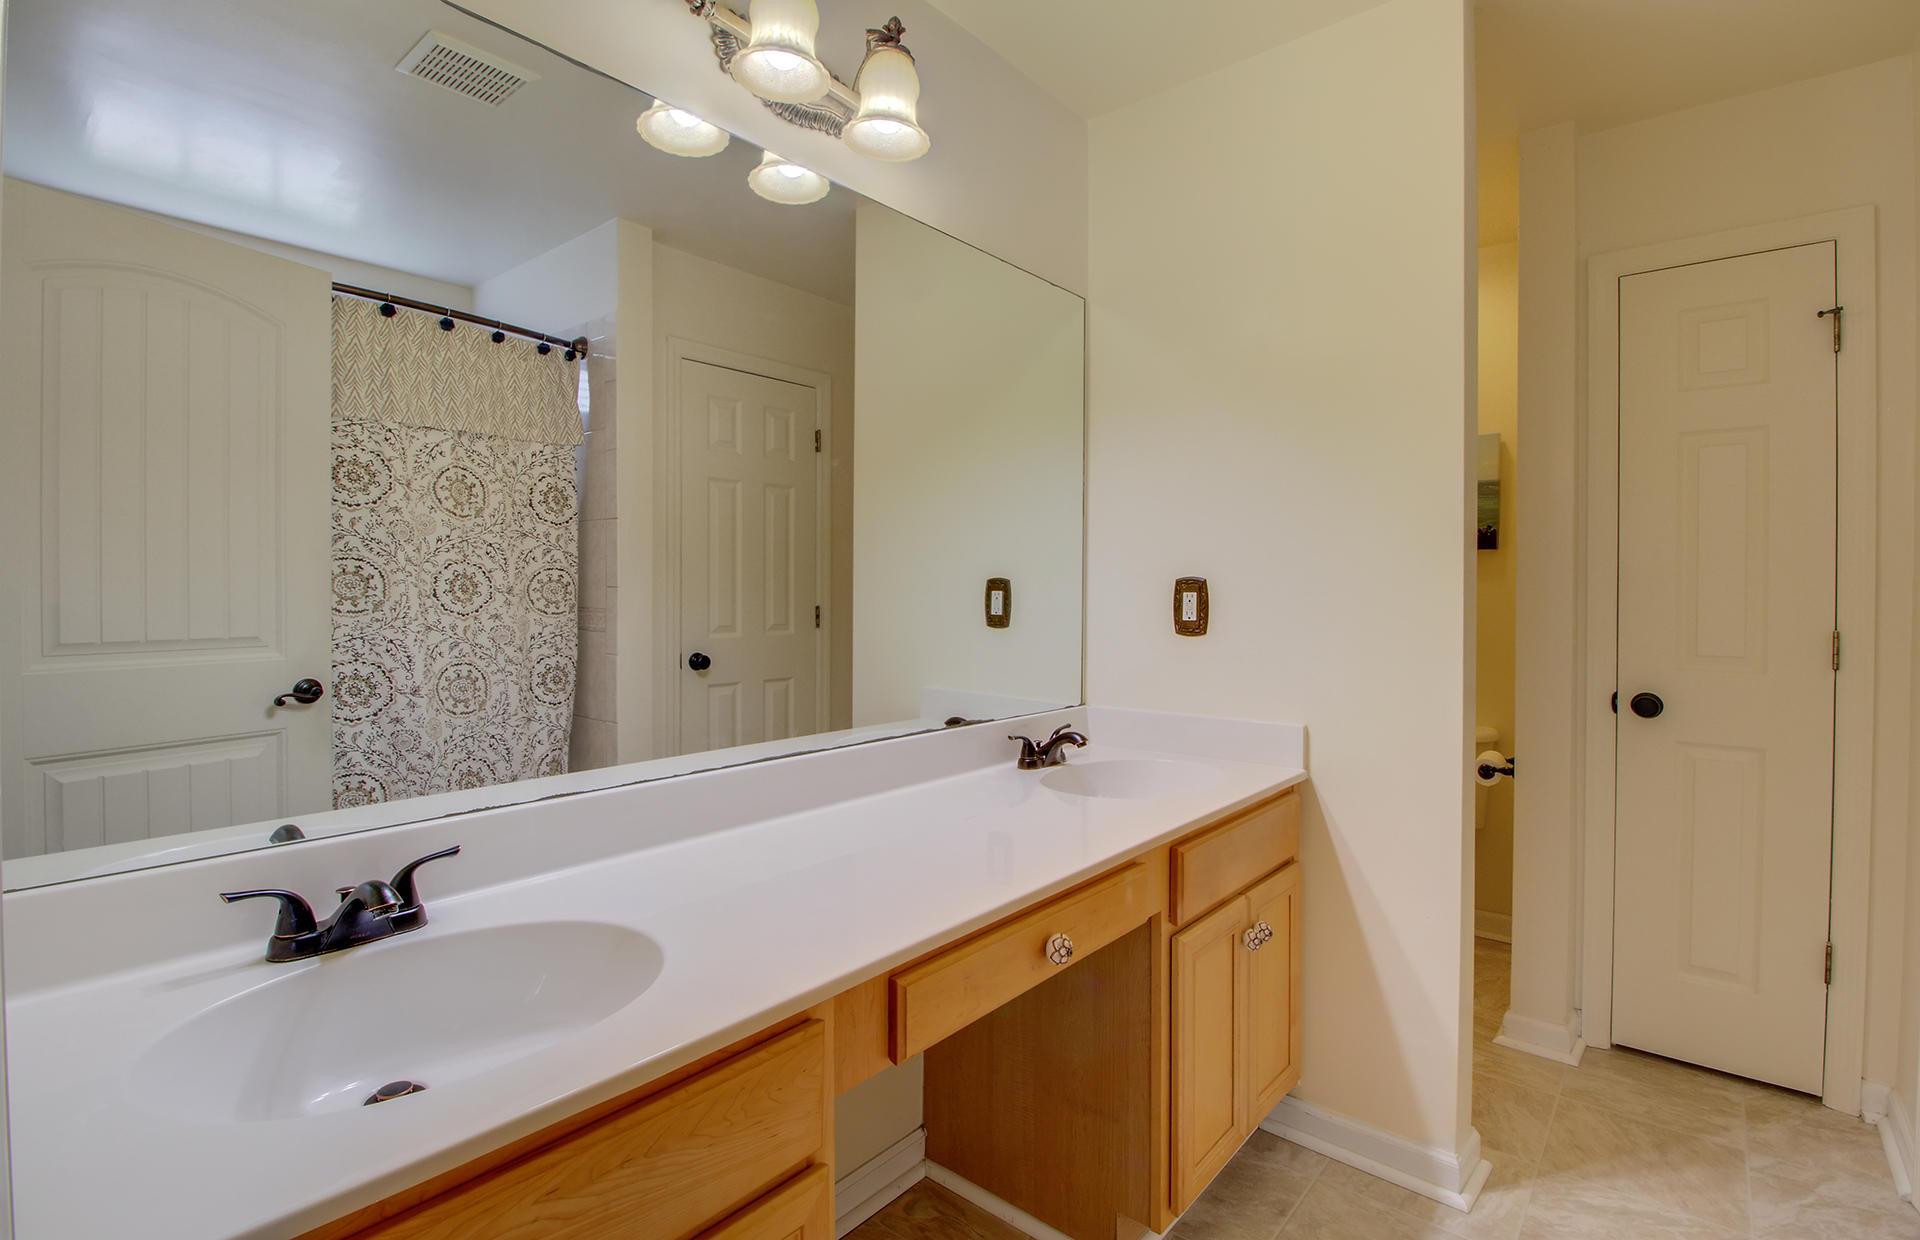 Park West Homes For Sale - 1500 Wellesley, Mount Pleasant, SC - 7